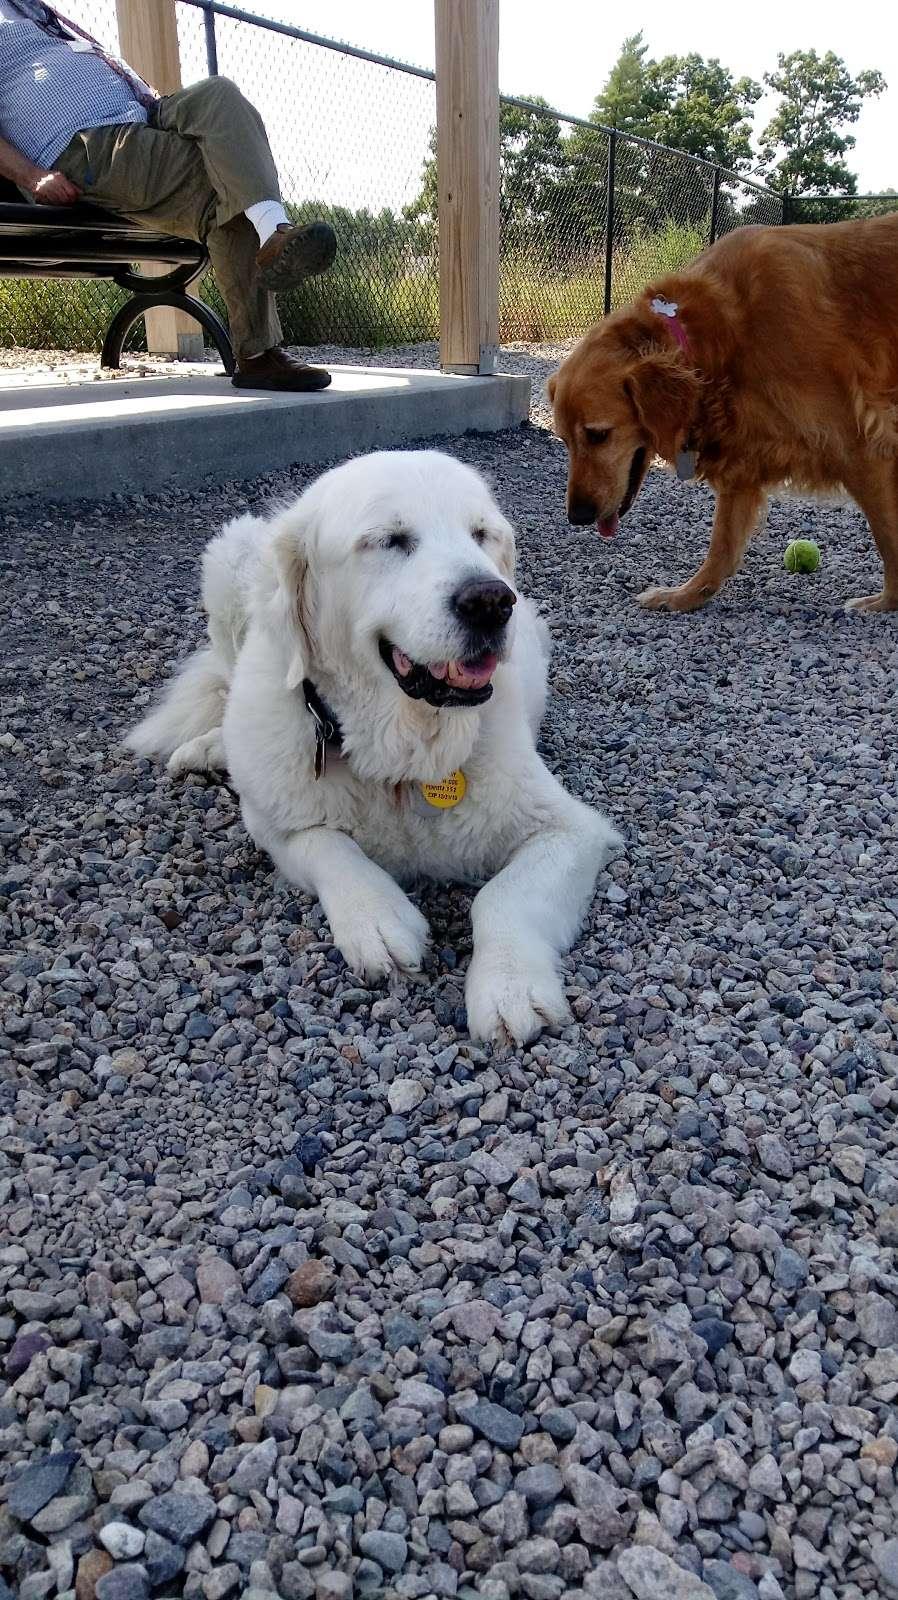 Boneyard Dog Park - park  | Photo 1 of 10 | Address: Kingston, MA 02364, USA